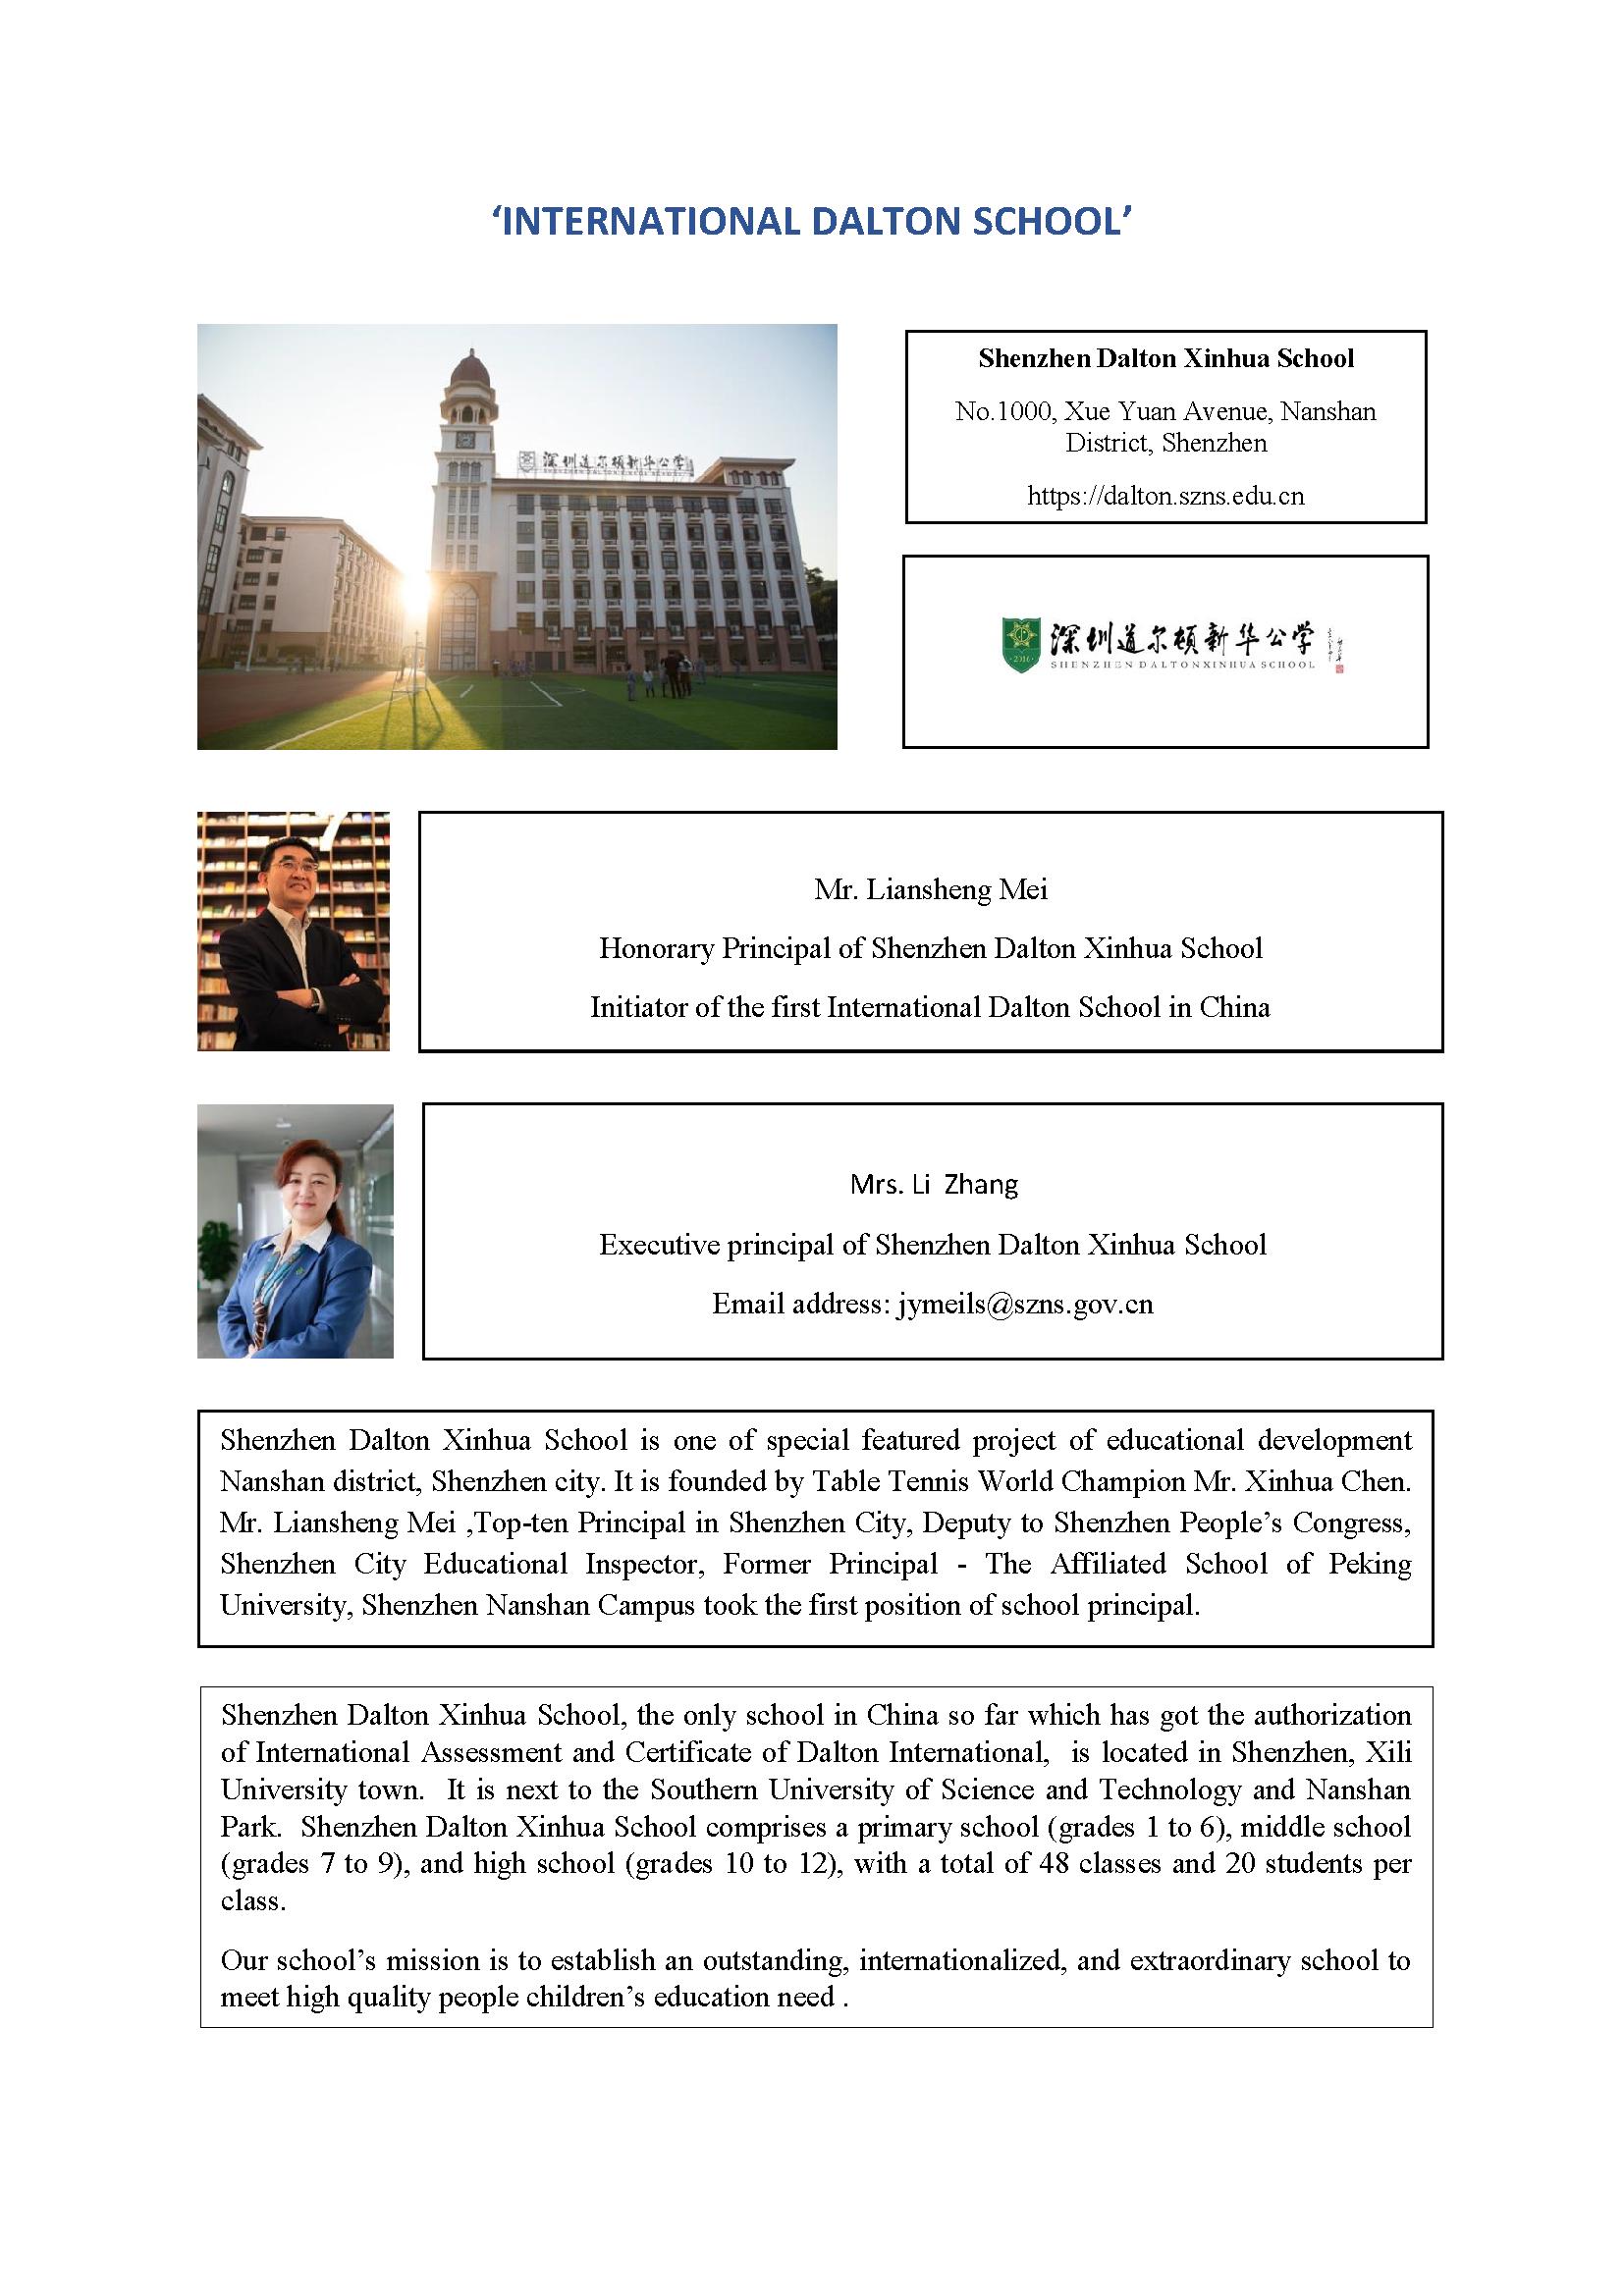 3. Shenzhen Dalton Xinhua School_